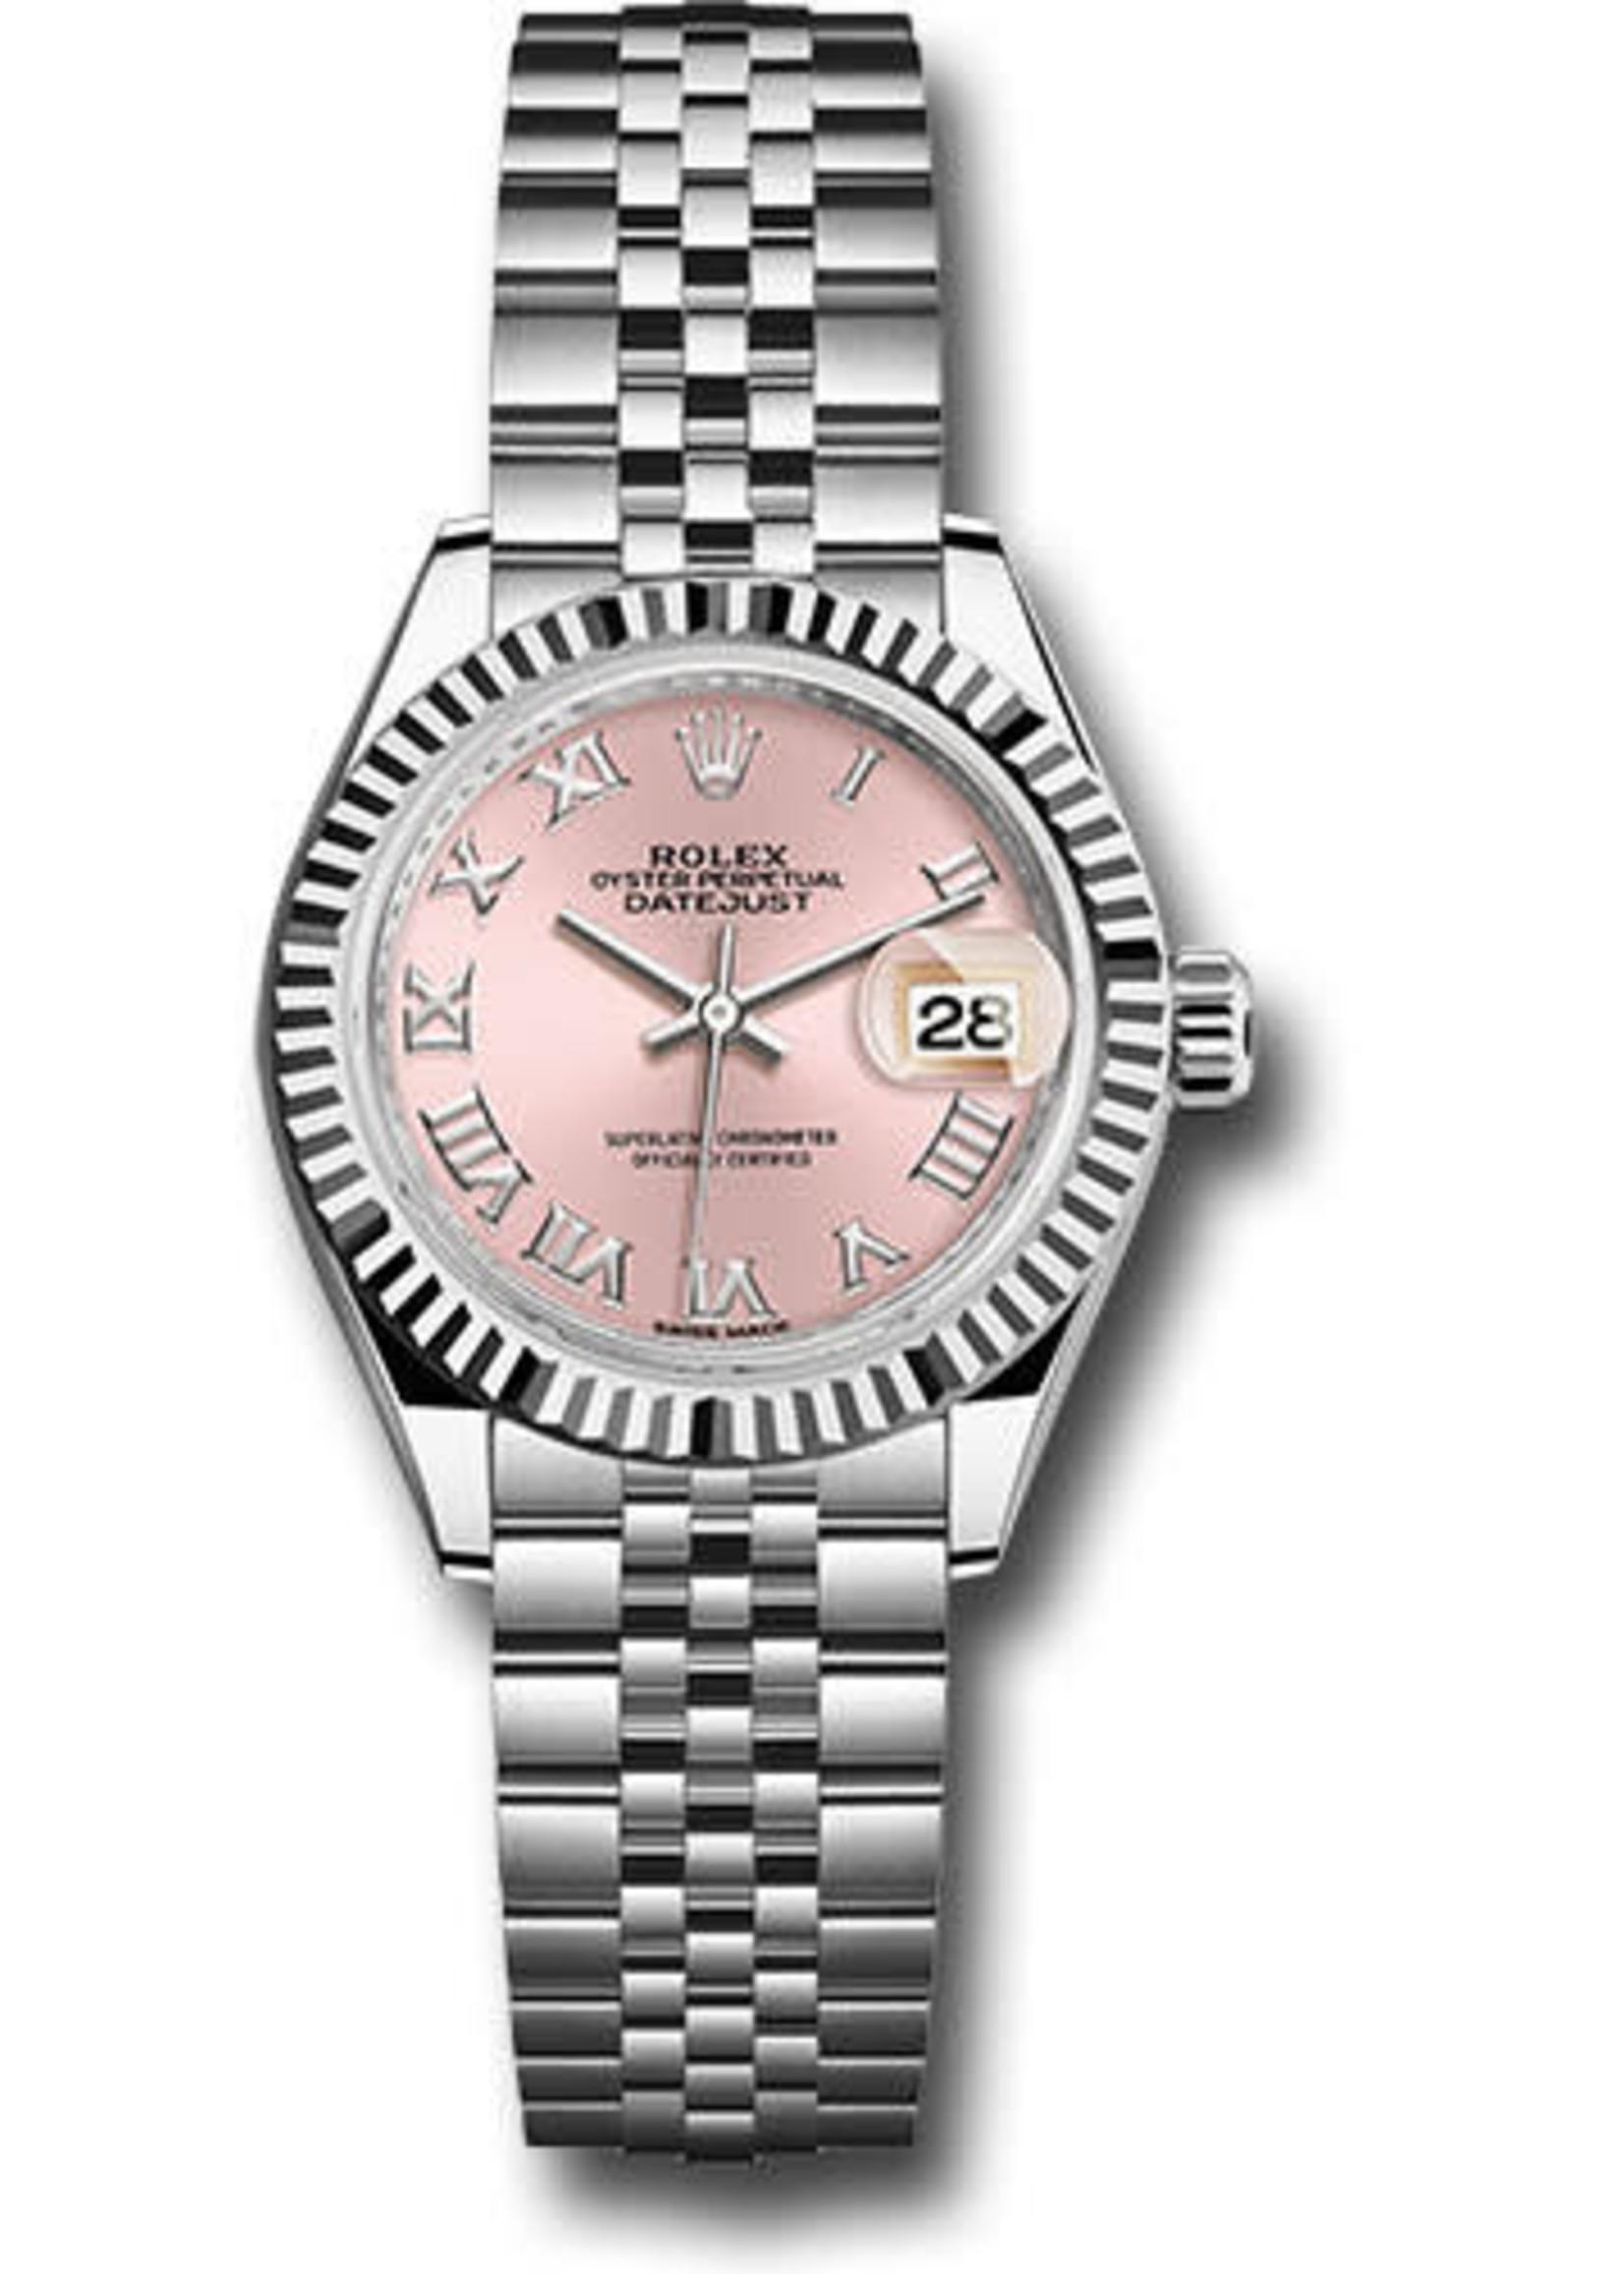 Rolex ROLEX DATEJUST 26MM (NEW OLD STOCK) #179174